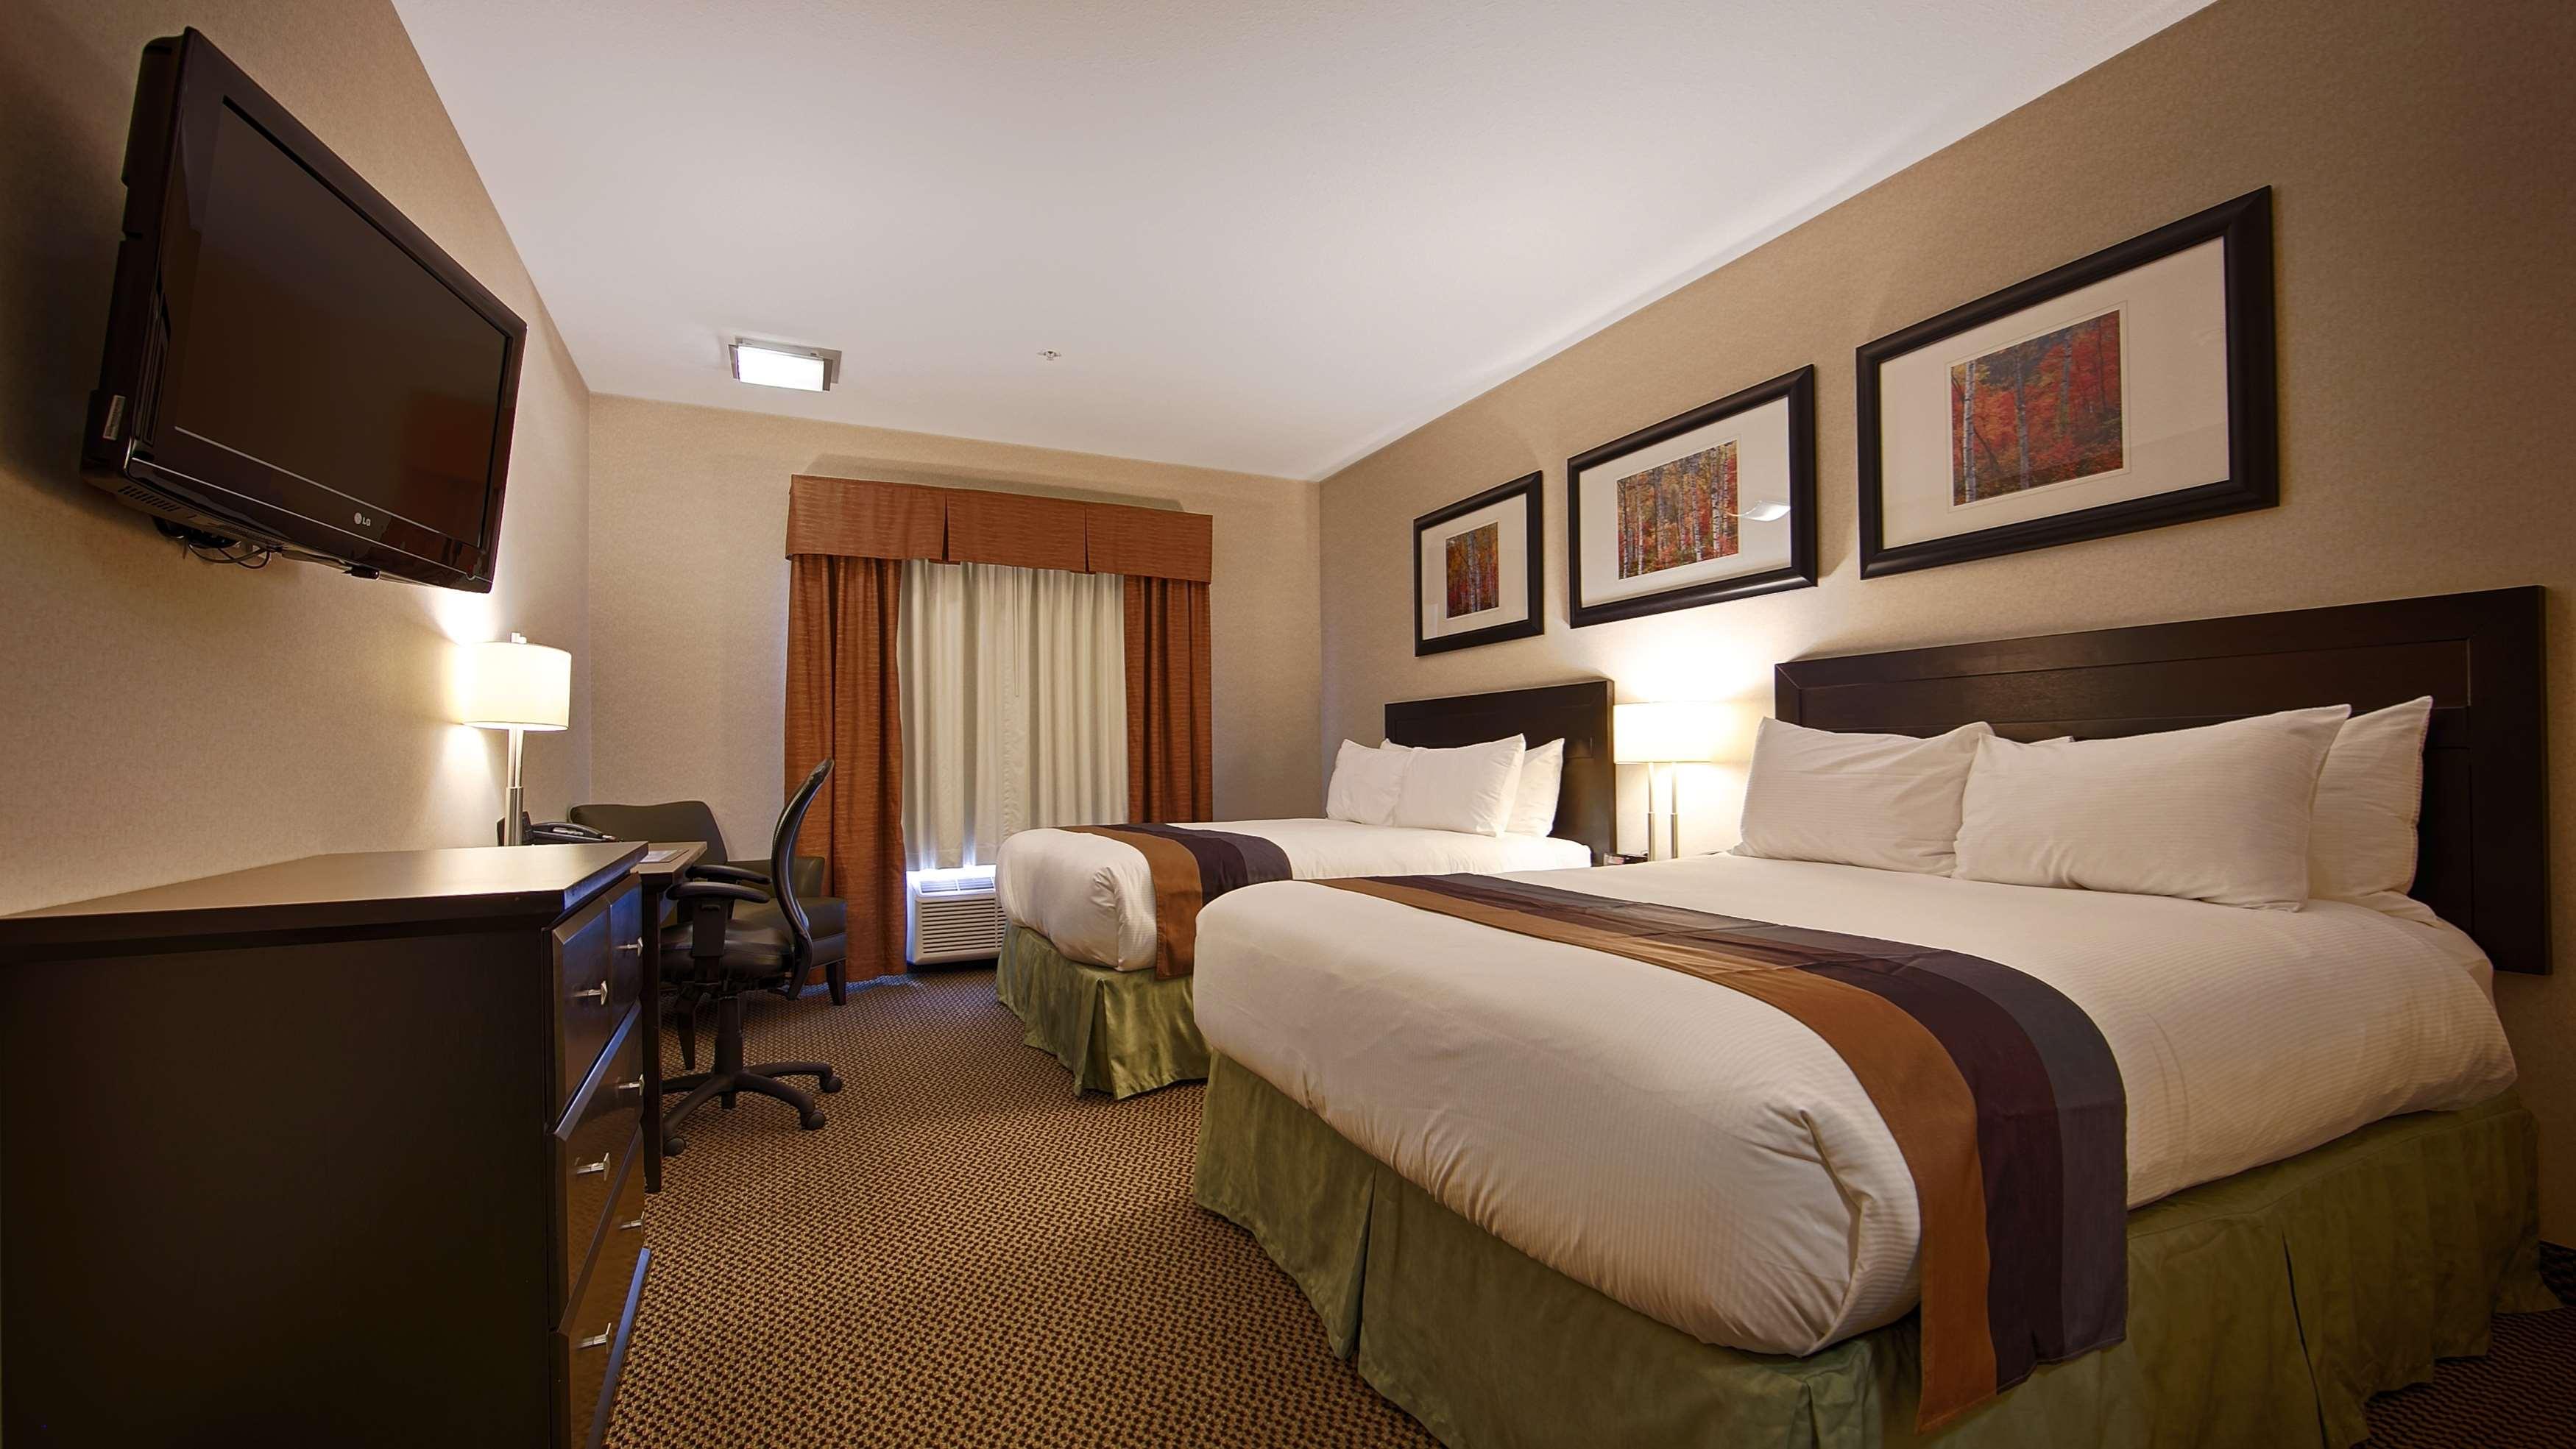 Nothing beats getting a good night's Best Western Wainwright Inn & Suites Wainwright (780)845-9934